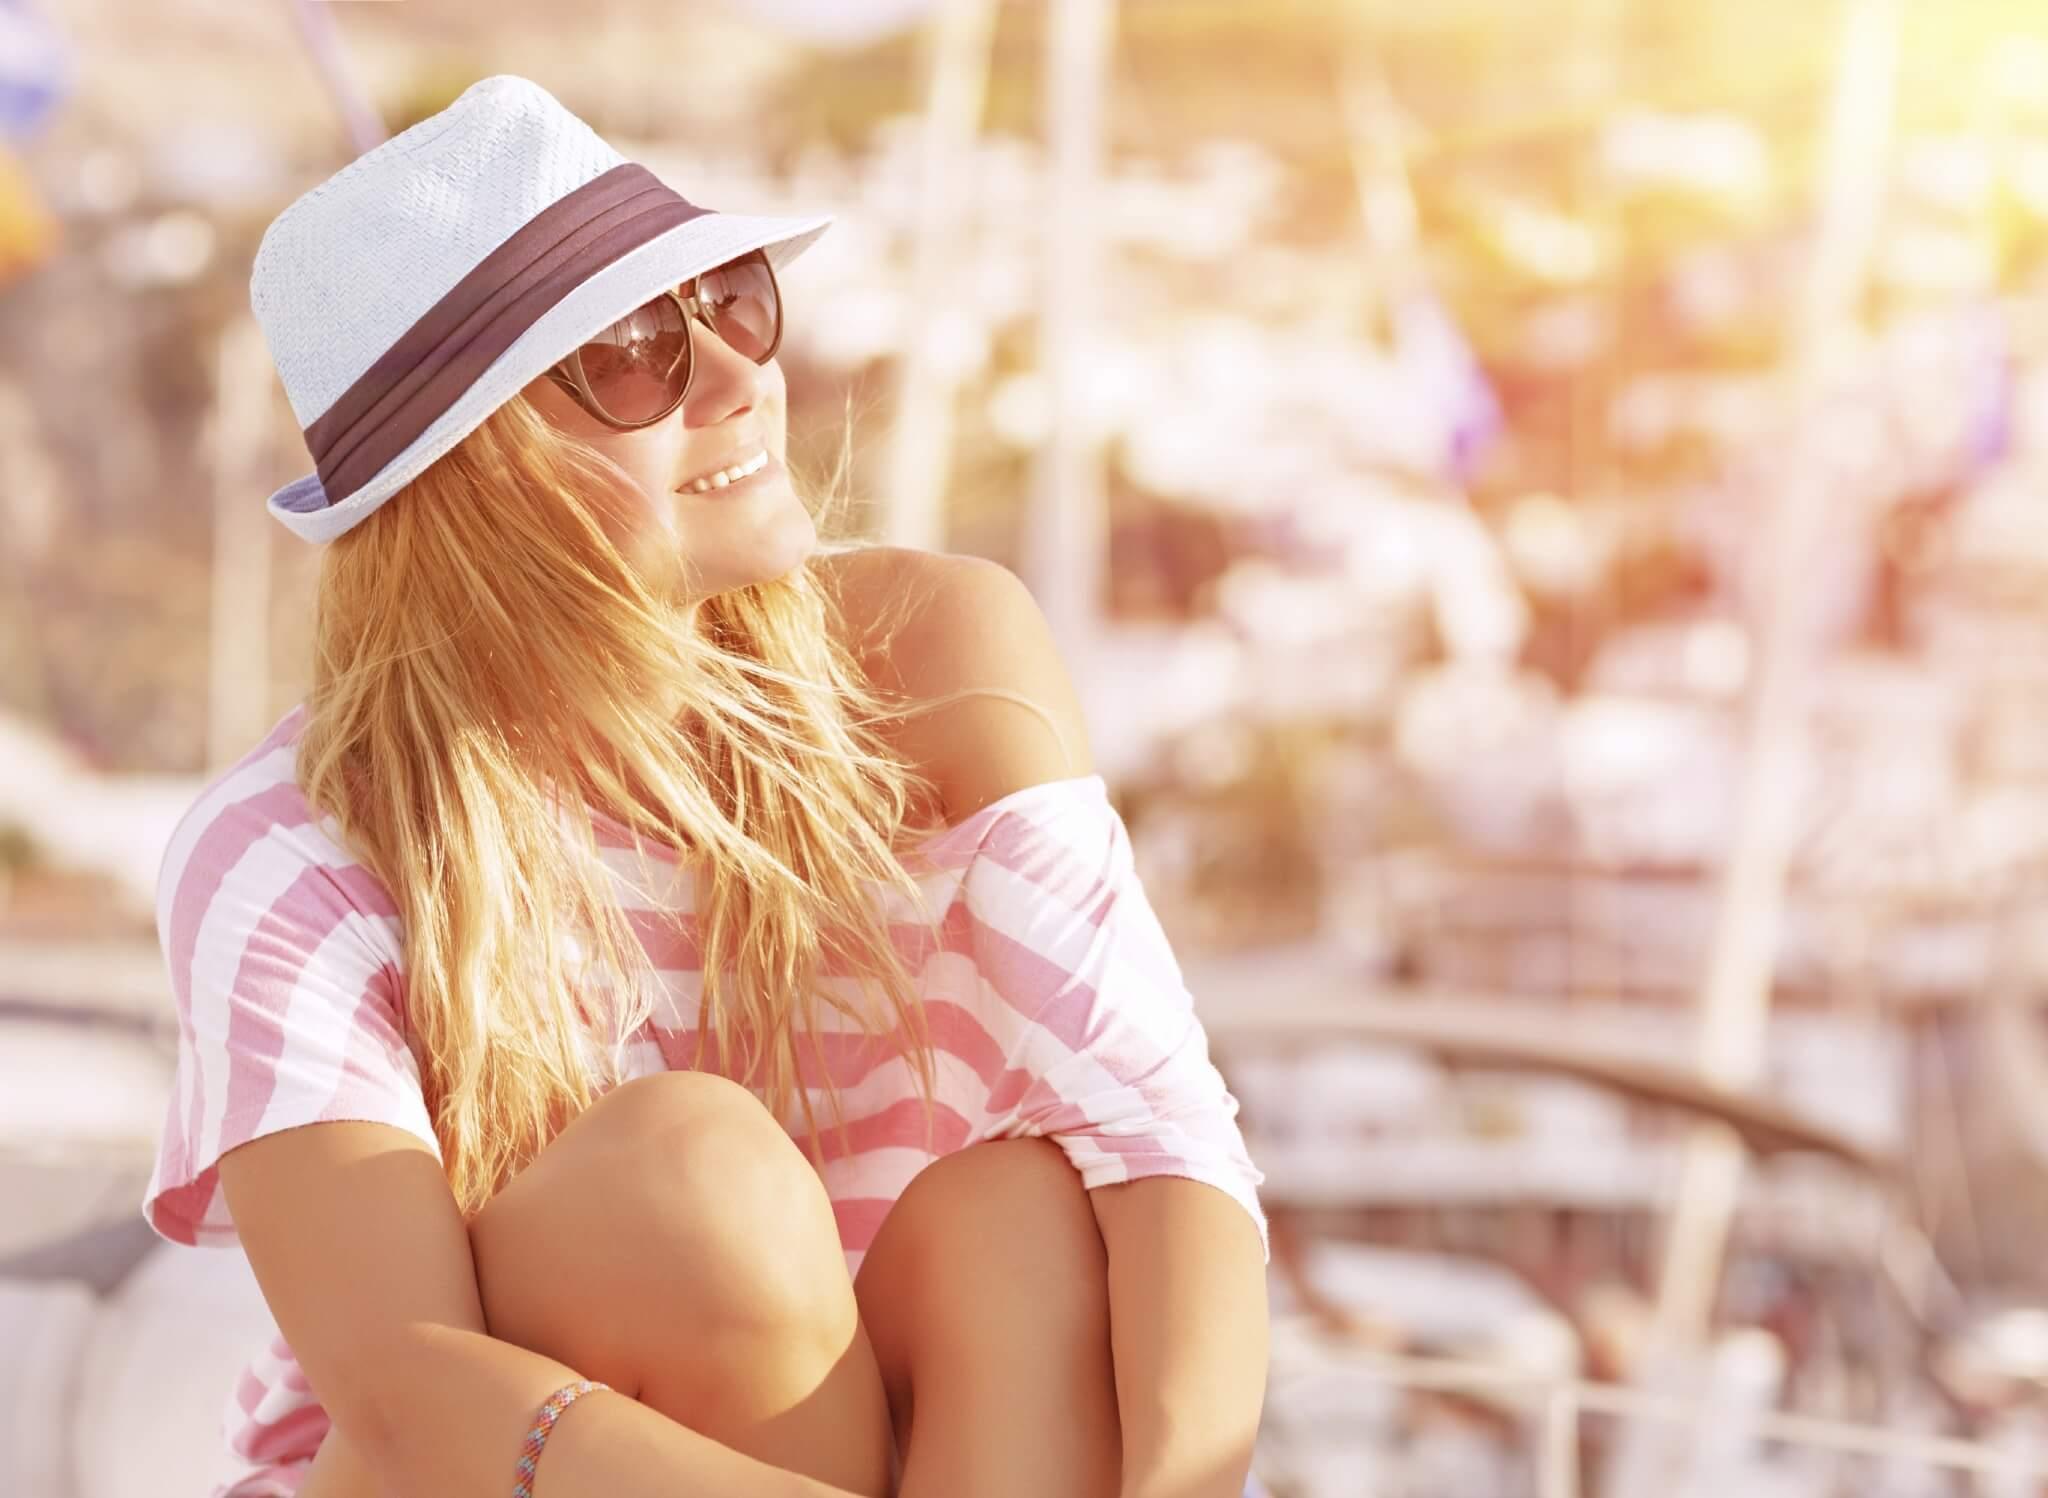 Luxury-summer-vacation-000065171871_Large.jpg.jpeg